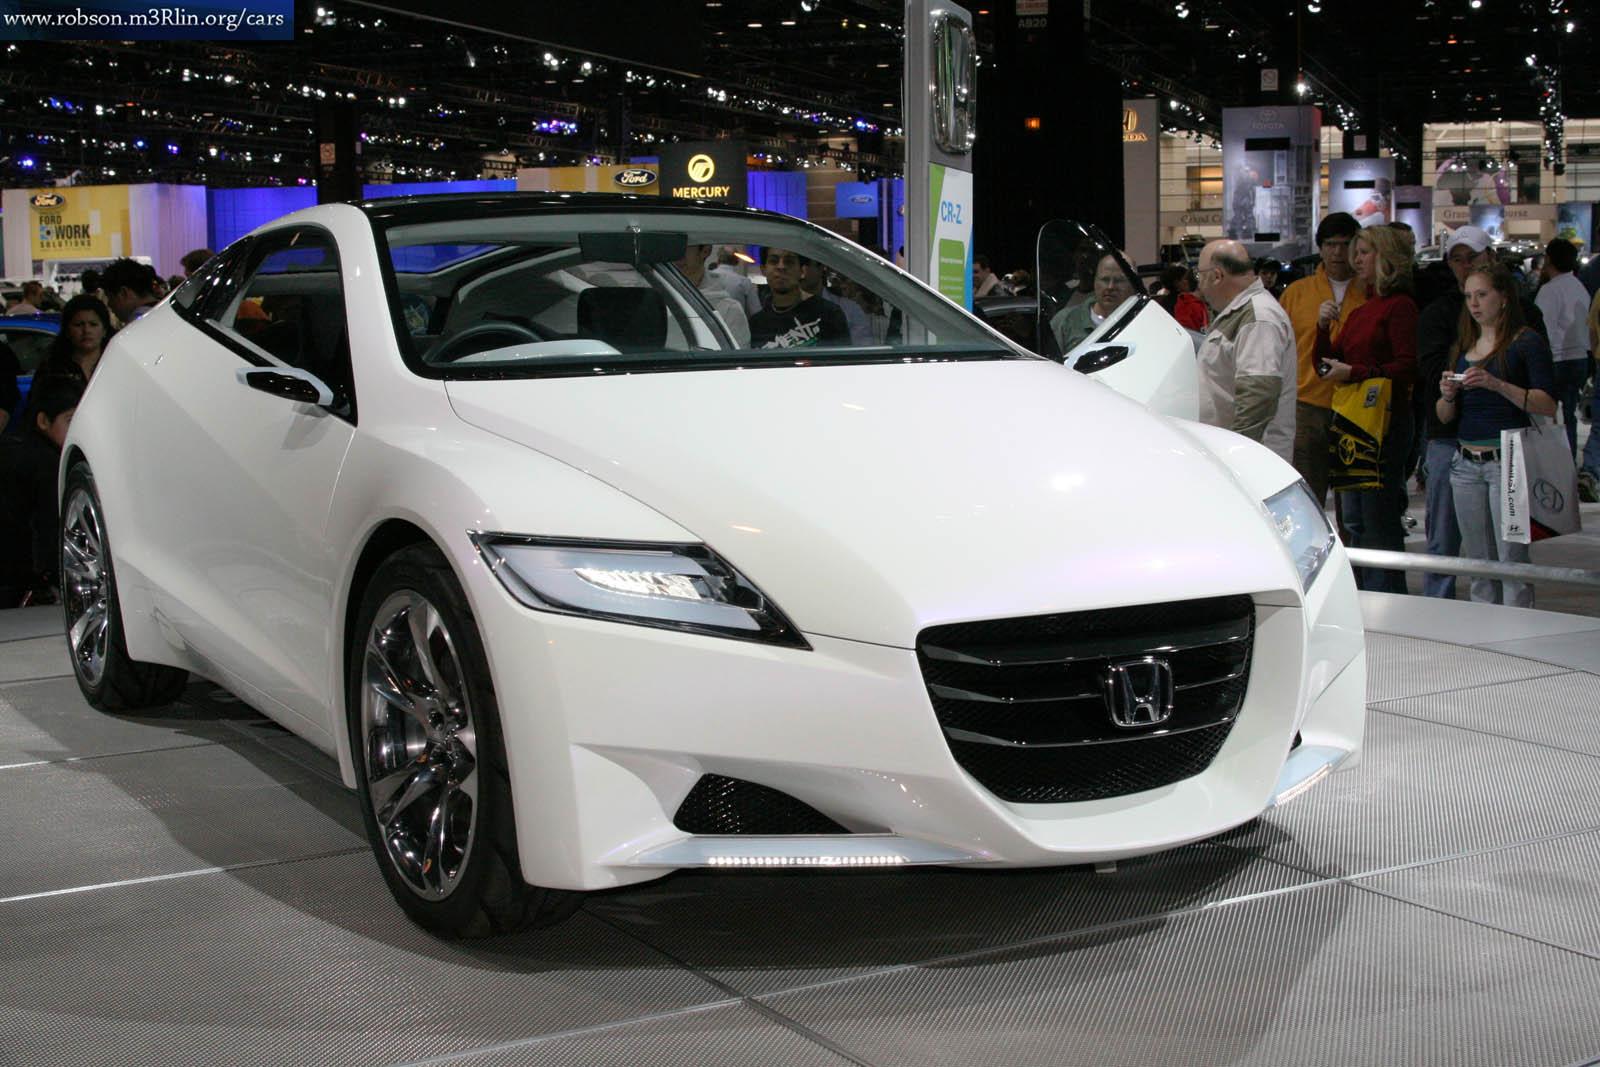 Honda Hybrid Electric Cars | Car Under 500 Dollars